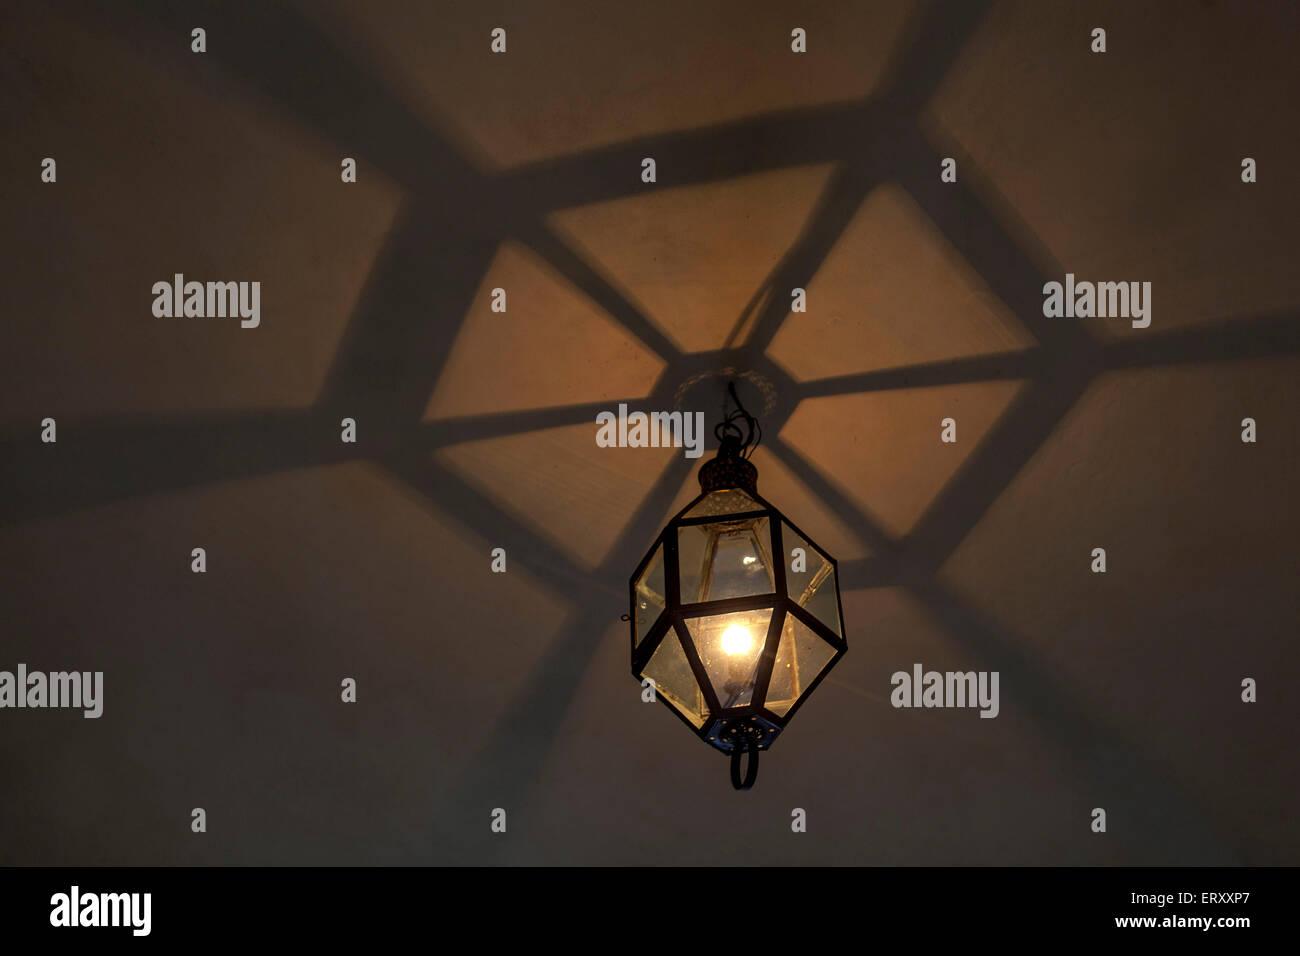 Manetin Castle lamp. West Bohemia, Czech Republic. - Stock Image